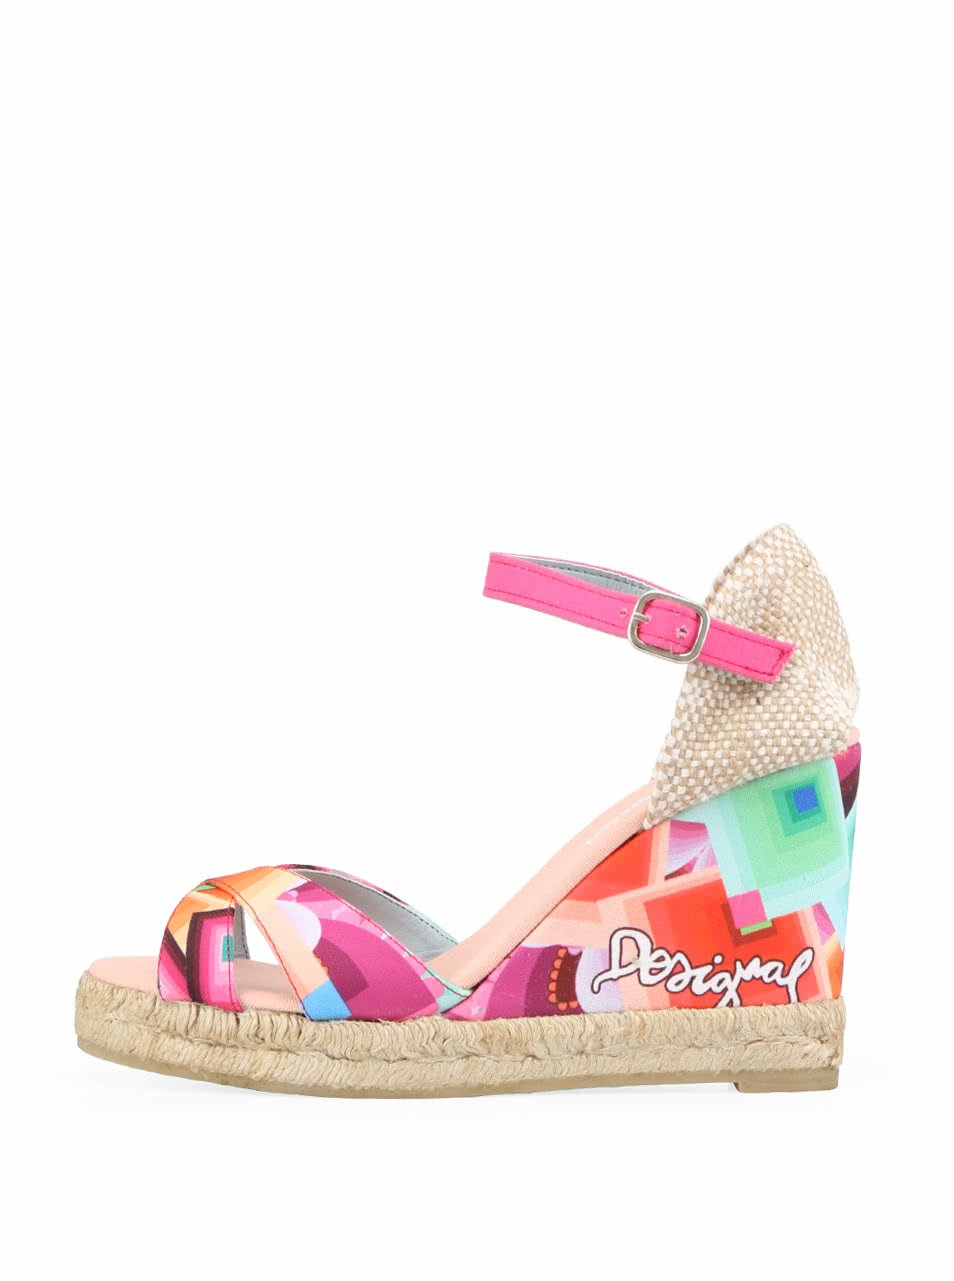 ecfb5349e86 Pestrobarevné sandálky Desigual na klínku – ŽENY   Boty   na klínku